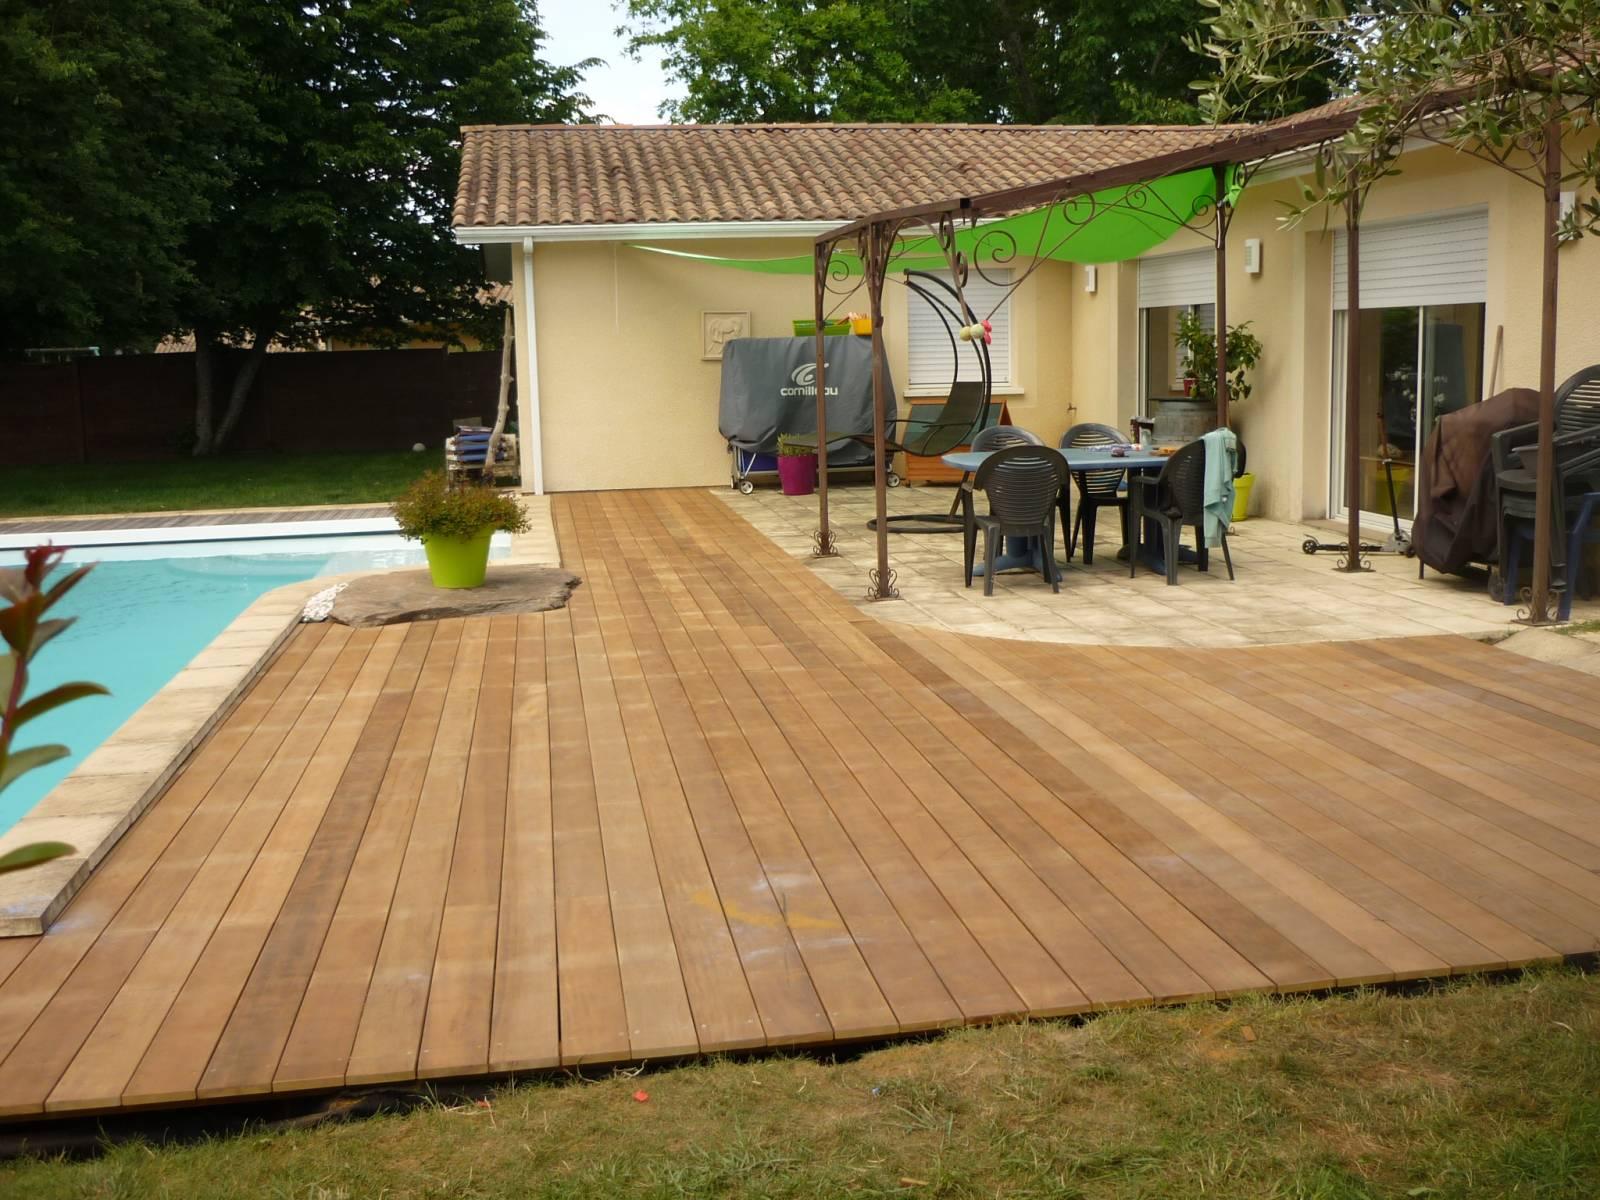 terrasse en bois exotique itauba a mérignac - DECK CAILLEBOTIS